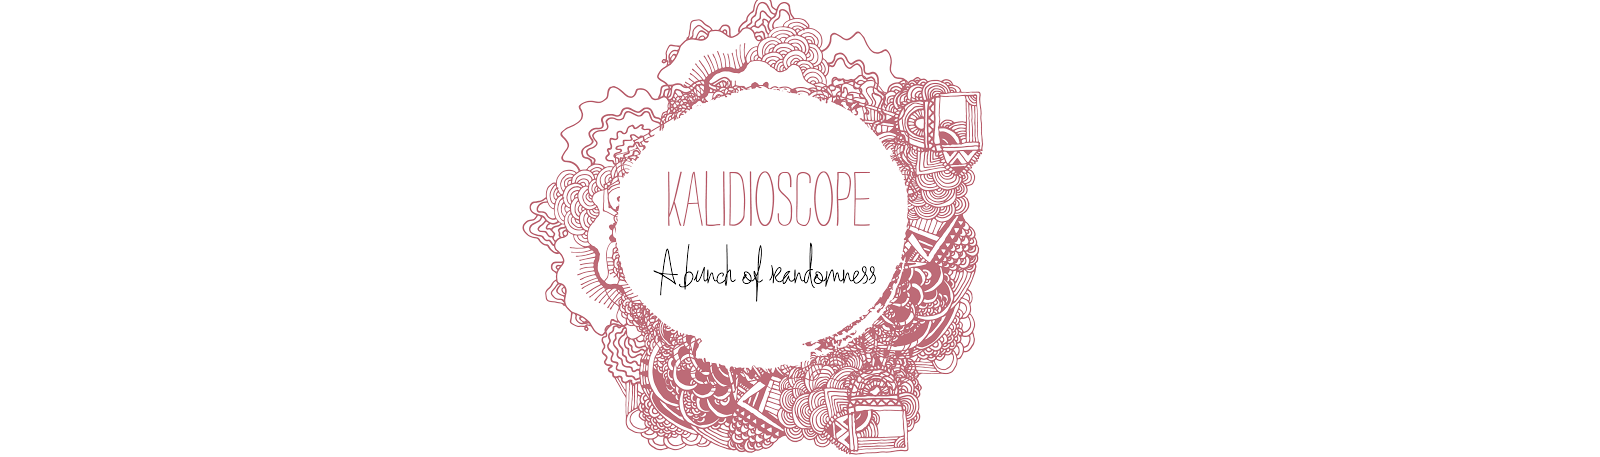 Kalidioscope